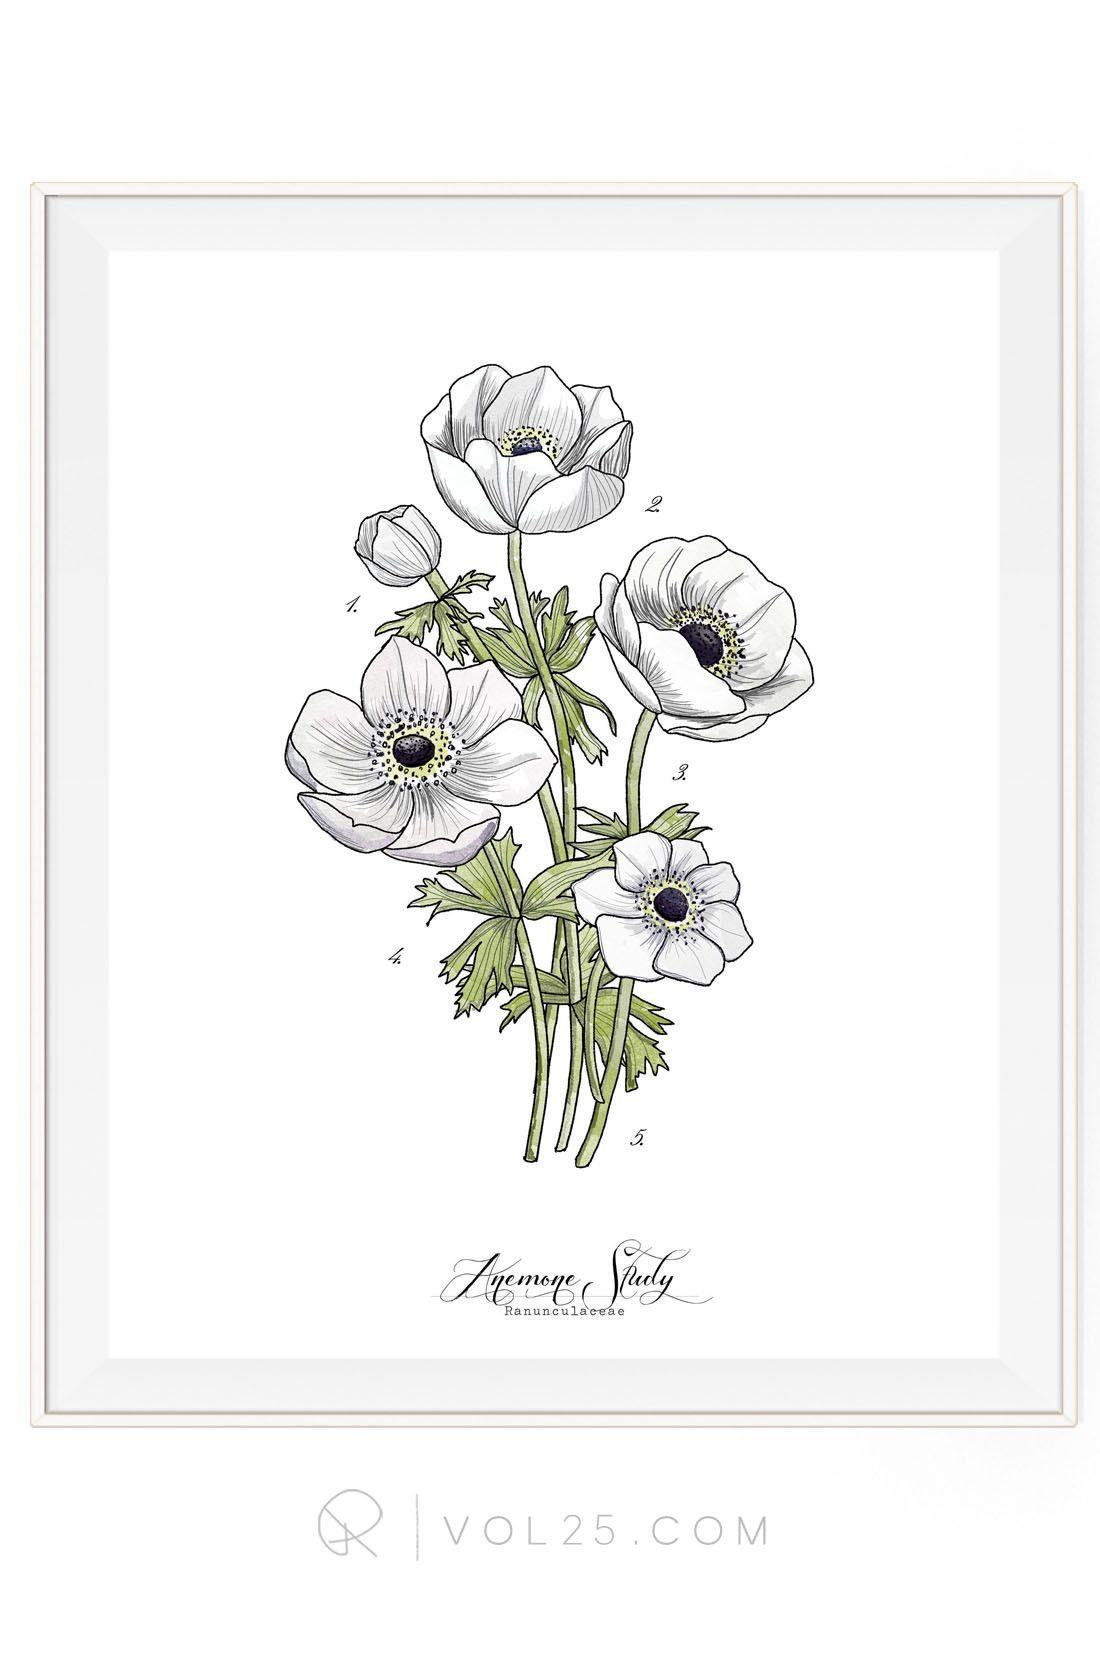 Anemone Flower Drawing : anemone, flower, drawing, Anemone, Study, Vol.1, Scientific, Textured, Cotton, Canvas, Print, Sizes, VOL25, Vol25, Flower, Drawing,, Floral, Sketches